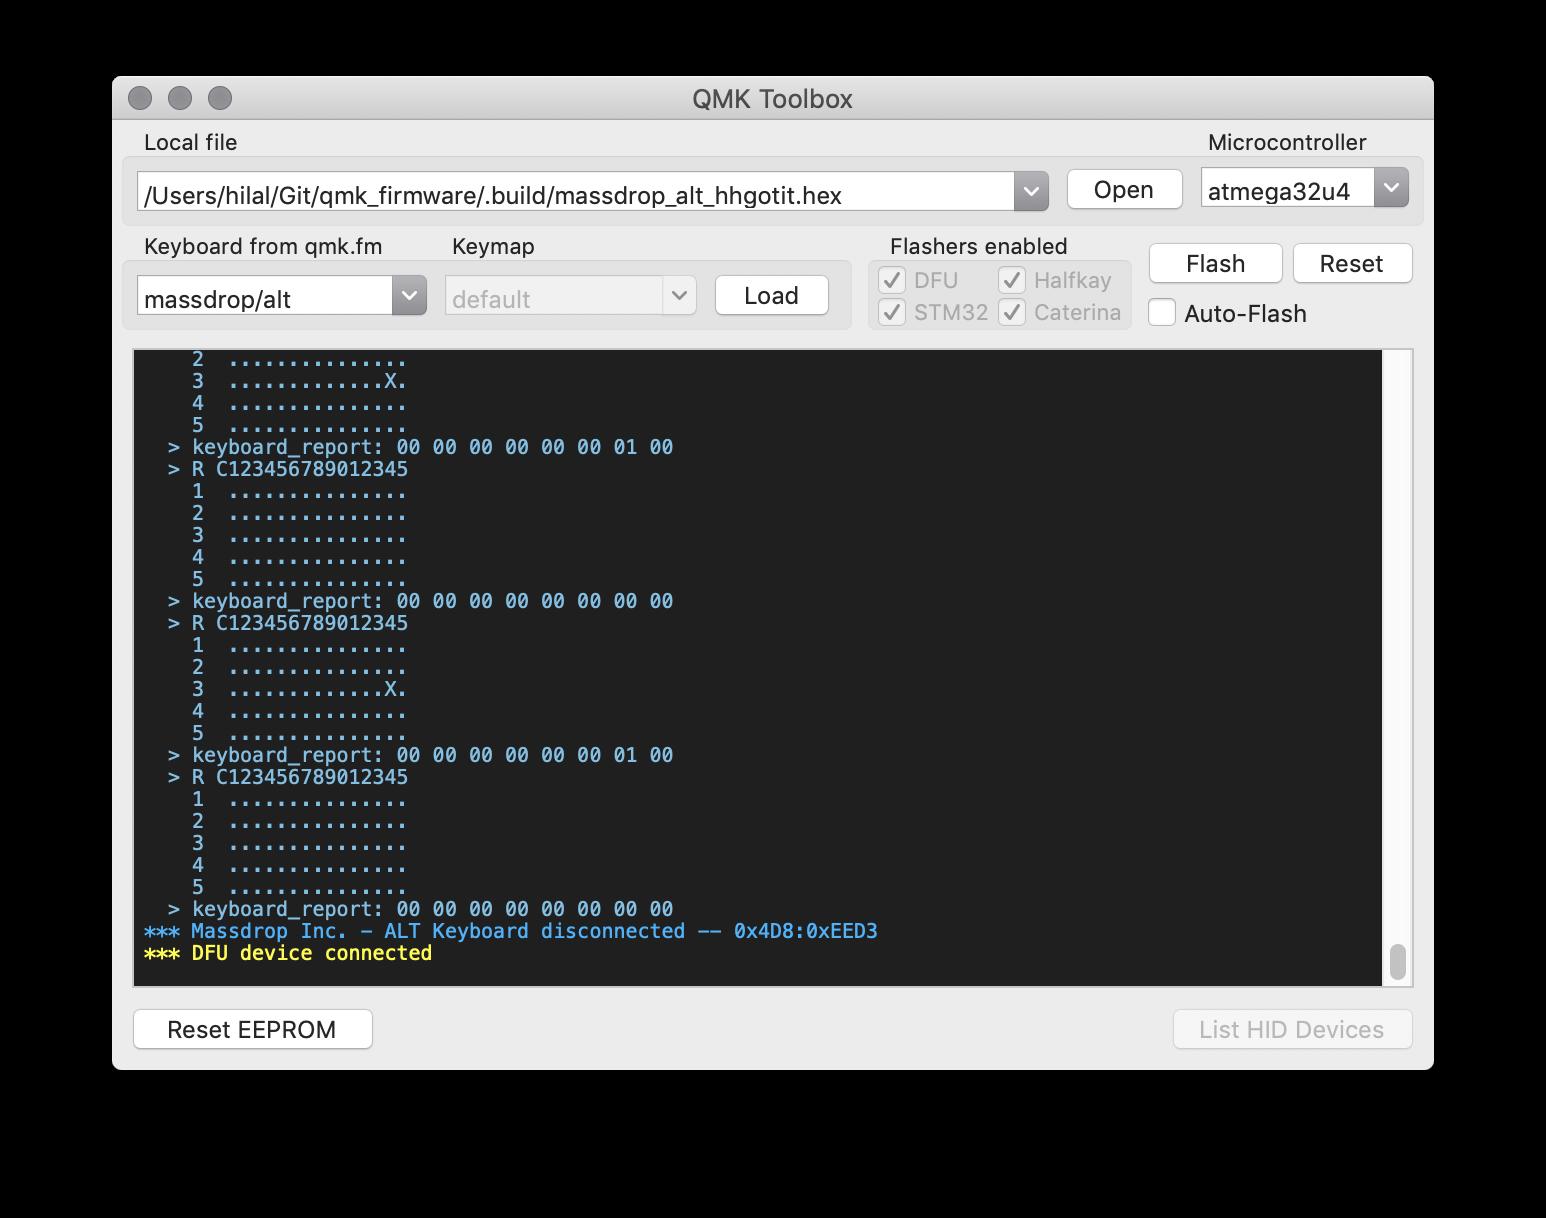 Massdrop ALT reboots into DFU mode randomly with #5619